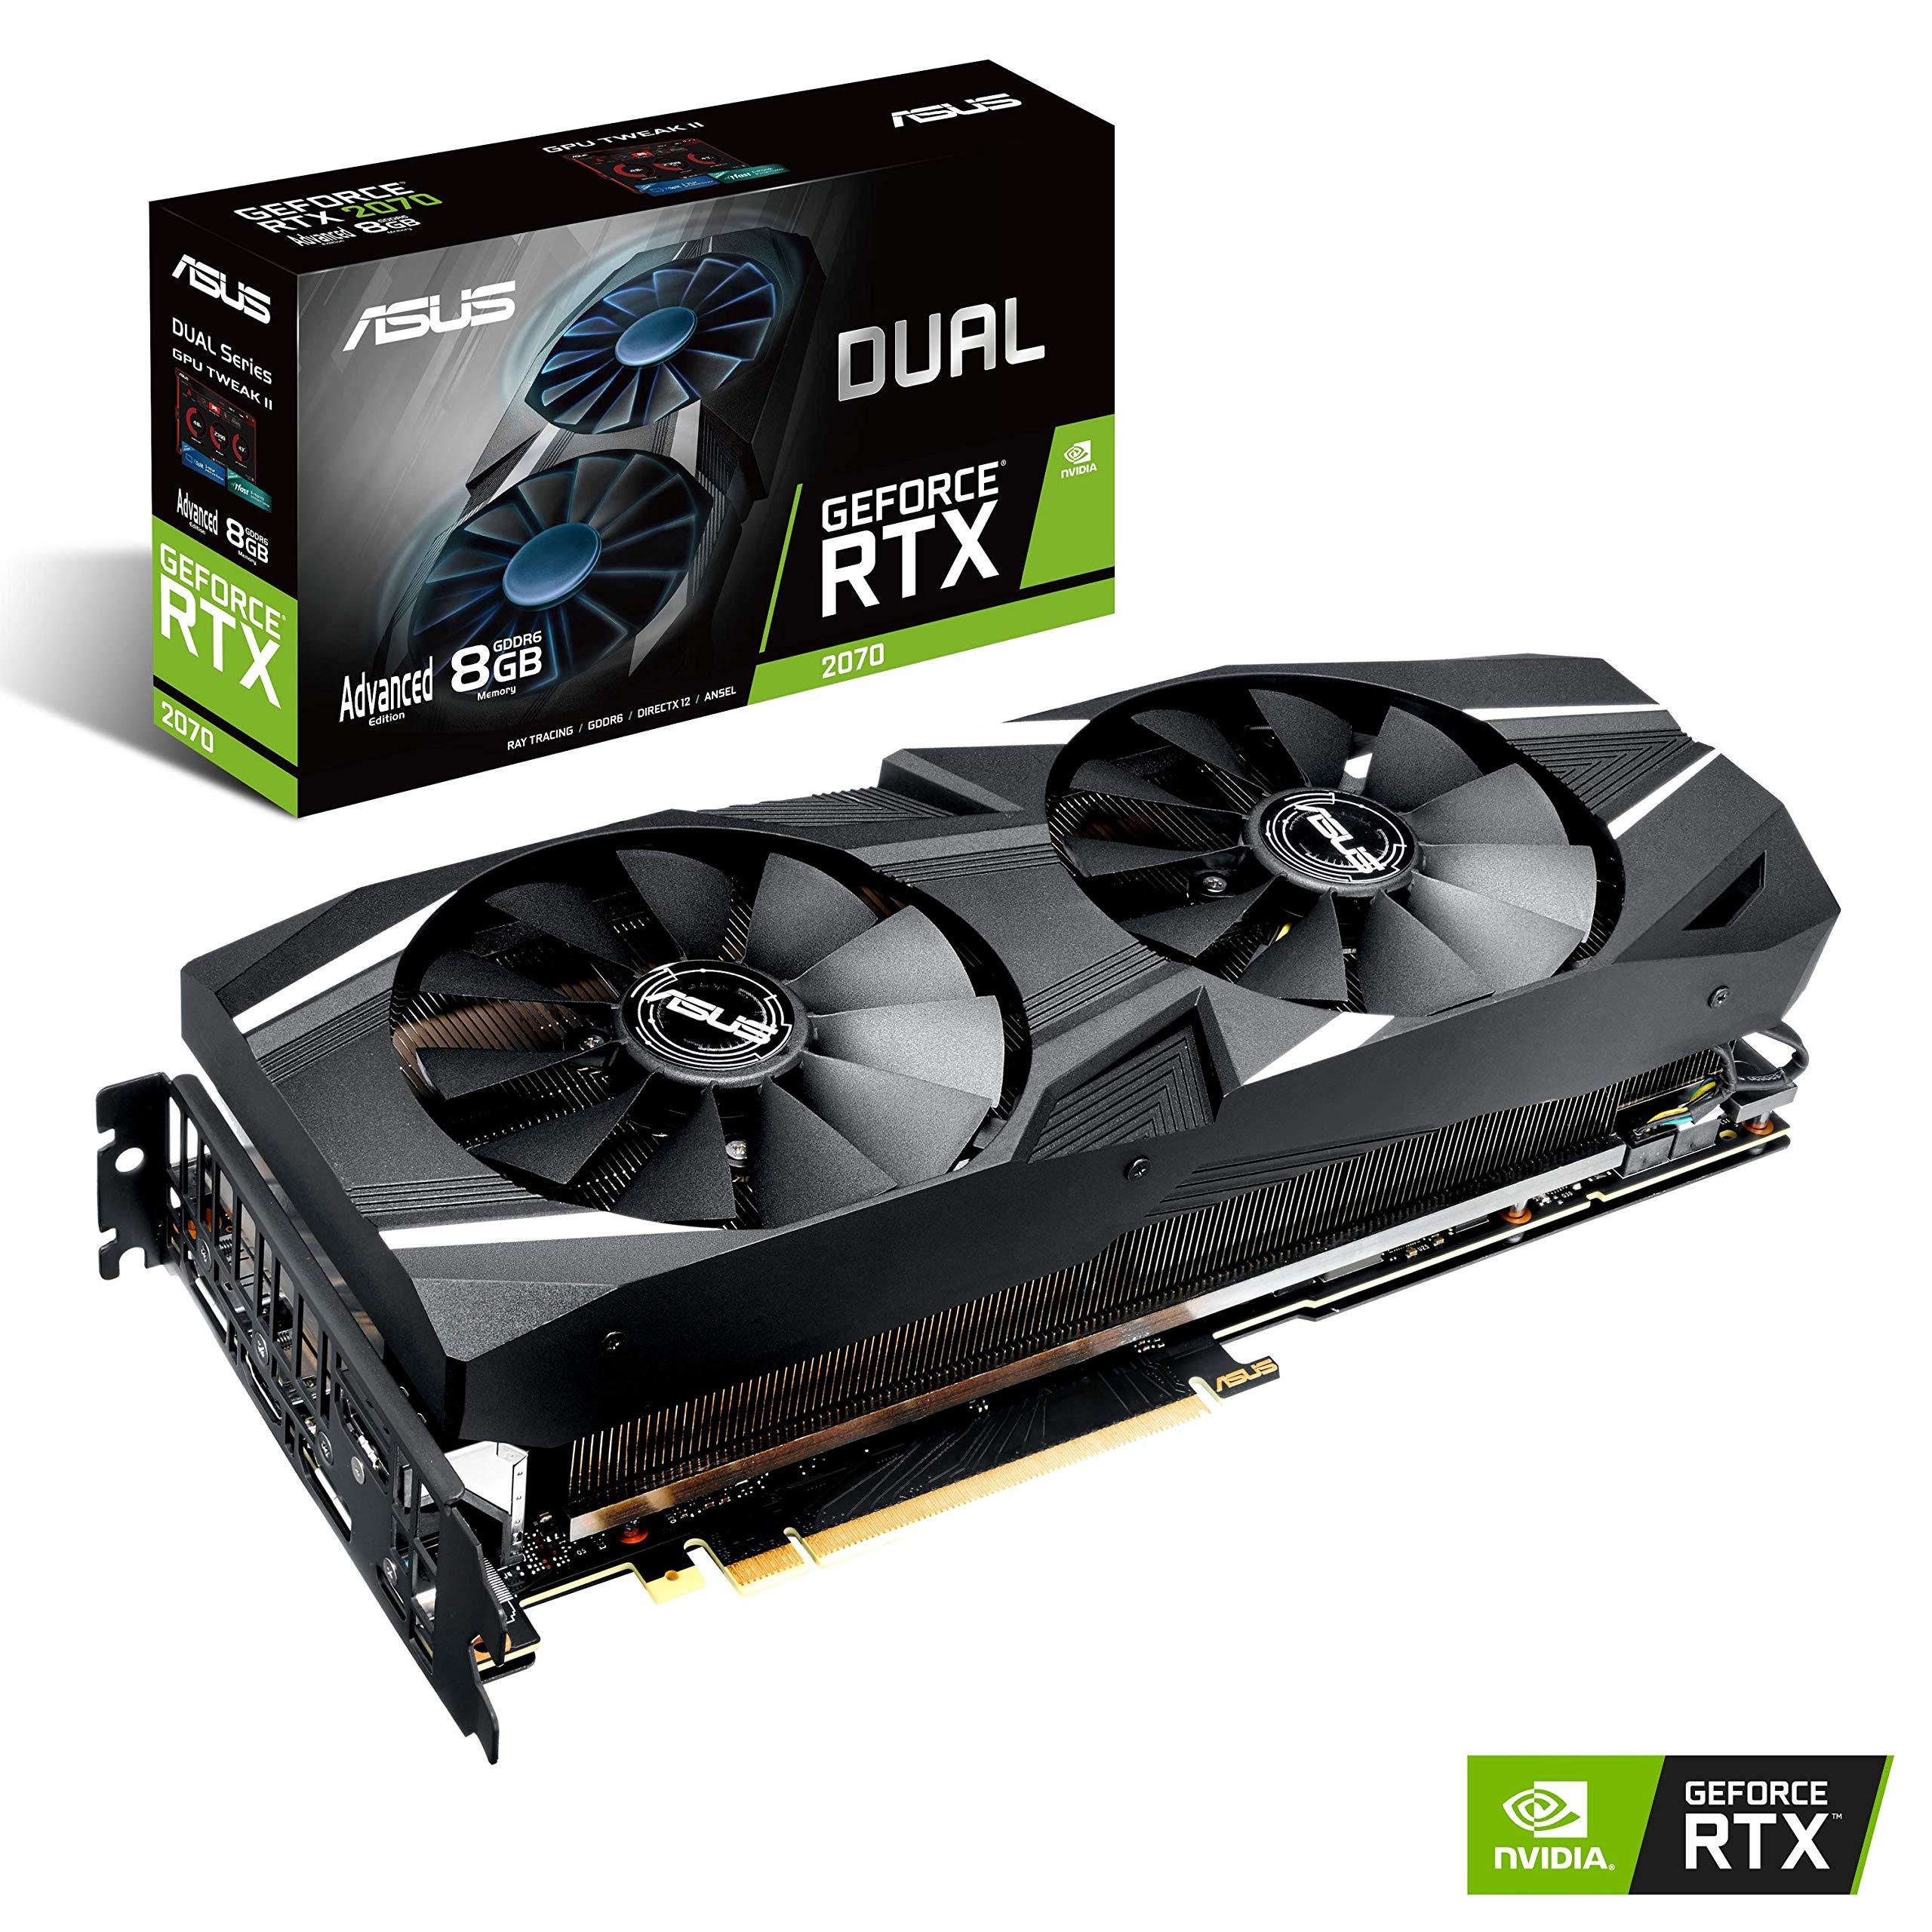 Asus VGA-ASU-2070-A8G Carte Graphique Nvidia Geforce RTX 2070 8G 1410 MHz PCI Express